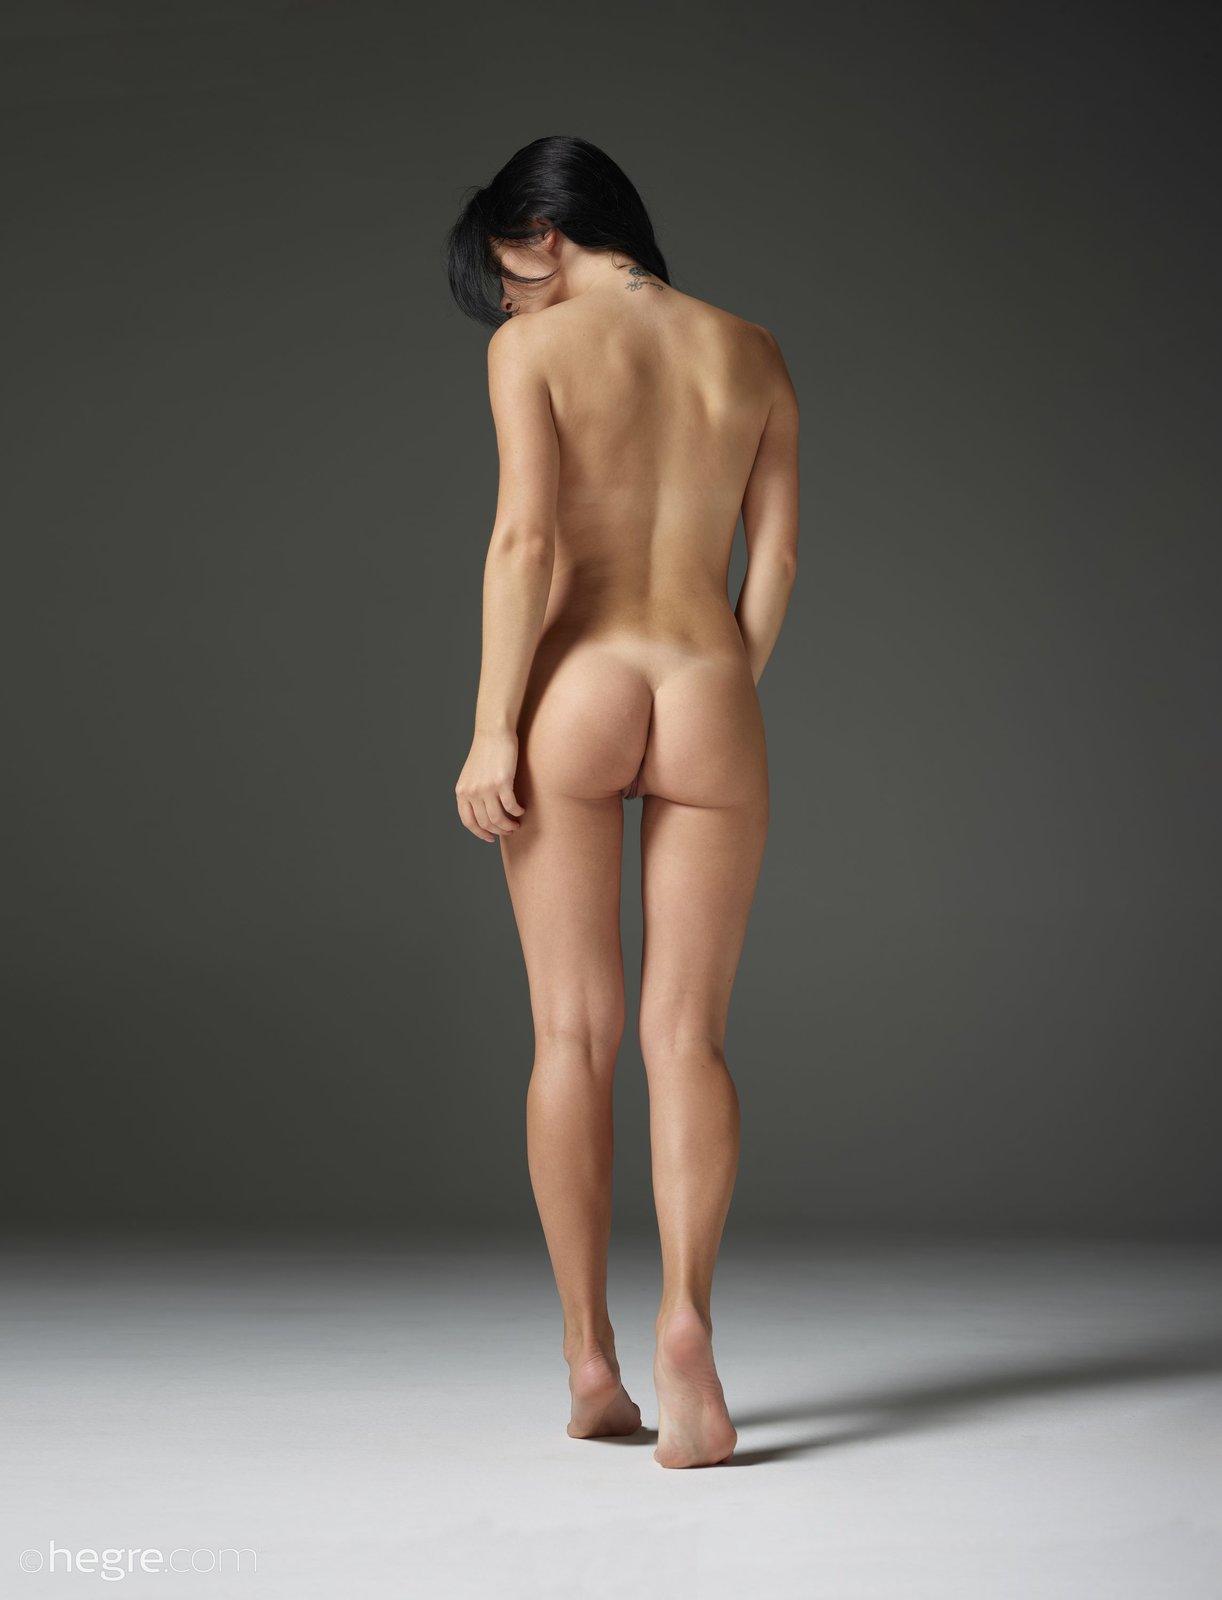 Naked cam female butt models nude